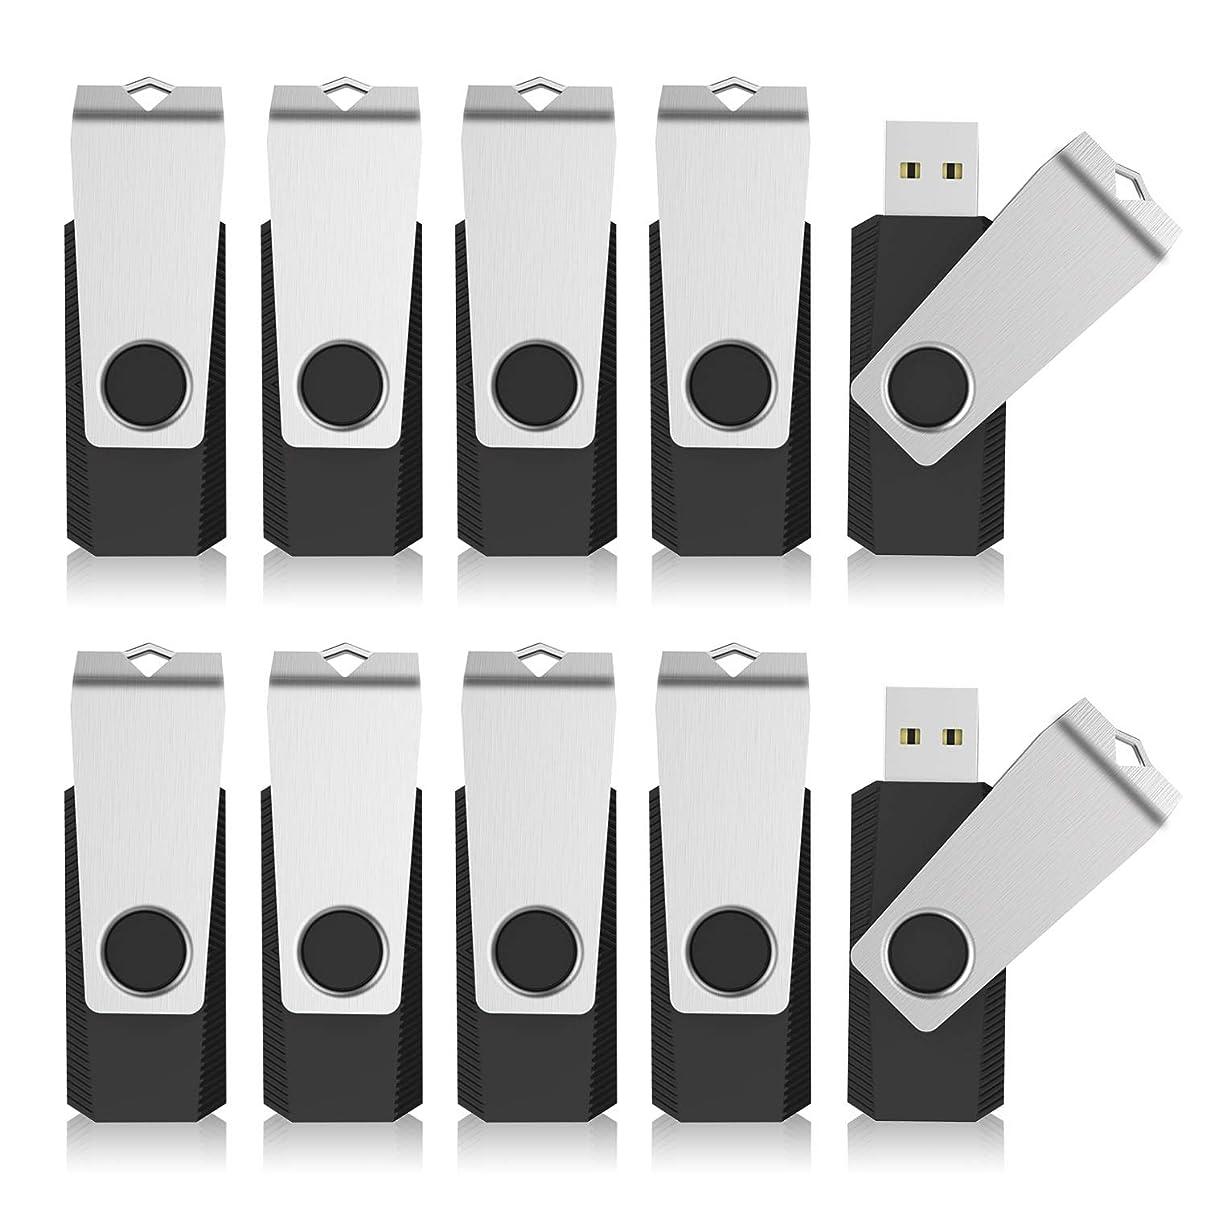 KEXIN USB Bulk 10 Pack 128MB USB Flash Drives Flash Drive Thumb Drive Jump Drive Bulk Flash Drives Swivel USB 2.0 (Without Logo, NOT 128 GB)